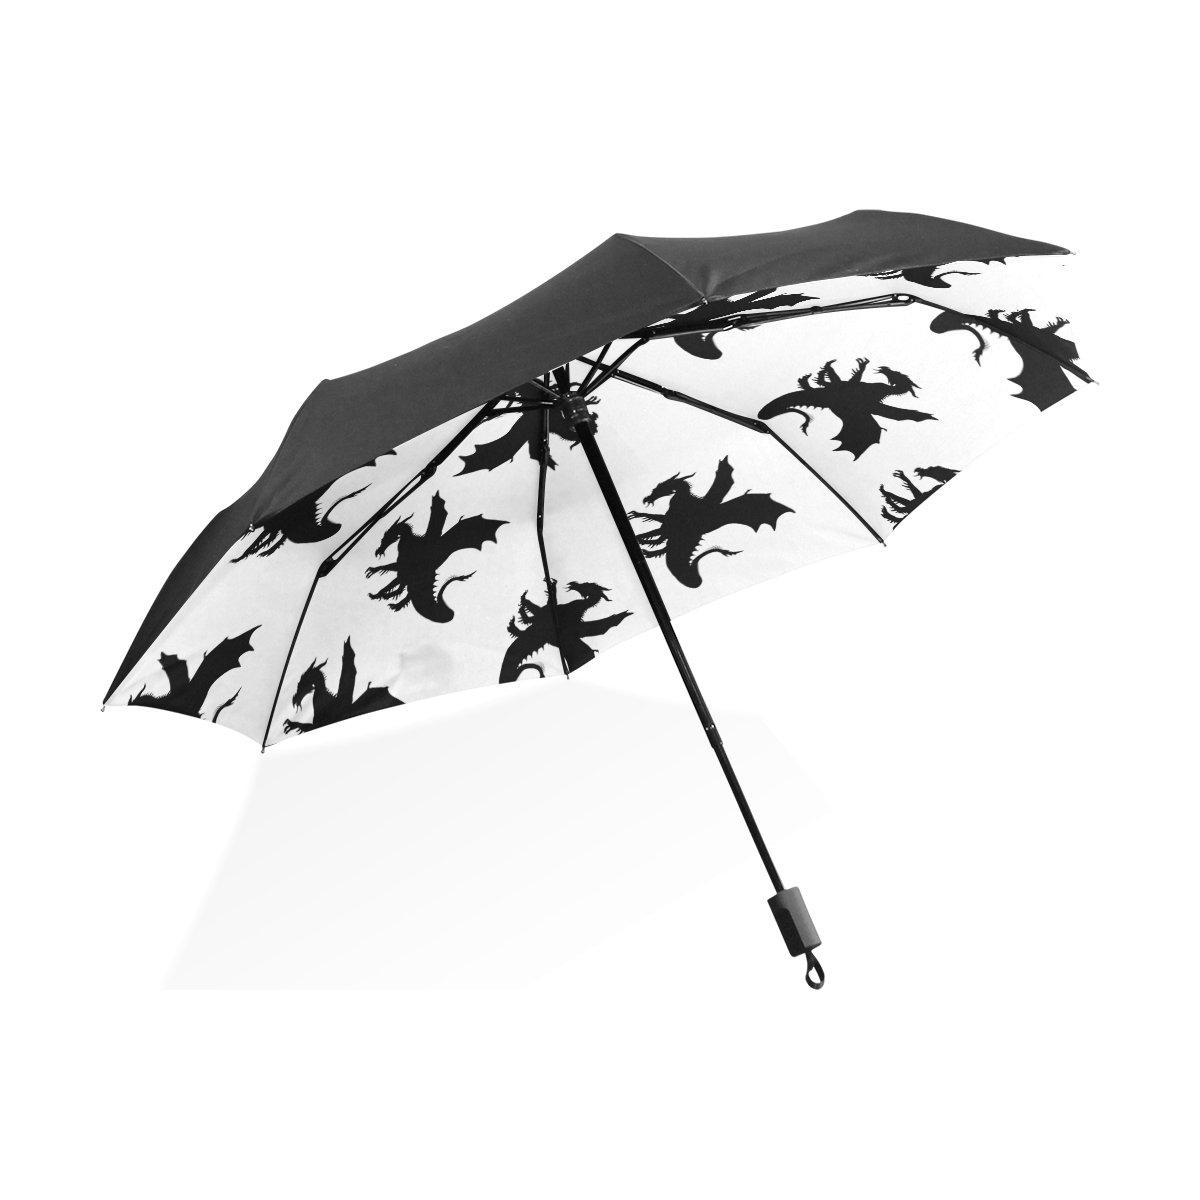 Florence Animal Dragon Patterns Foldable Sun-proof Umbrella Windproof Anti-UV Umbrella Compact Travel Portable Lightweight Sun Umbrella